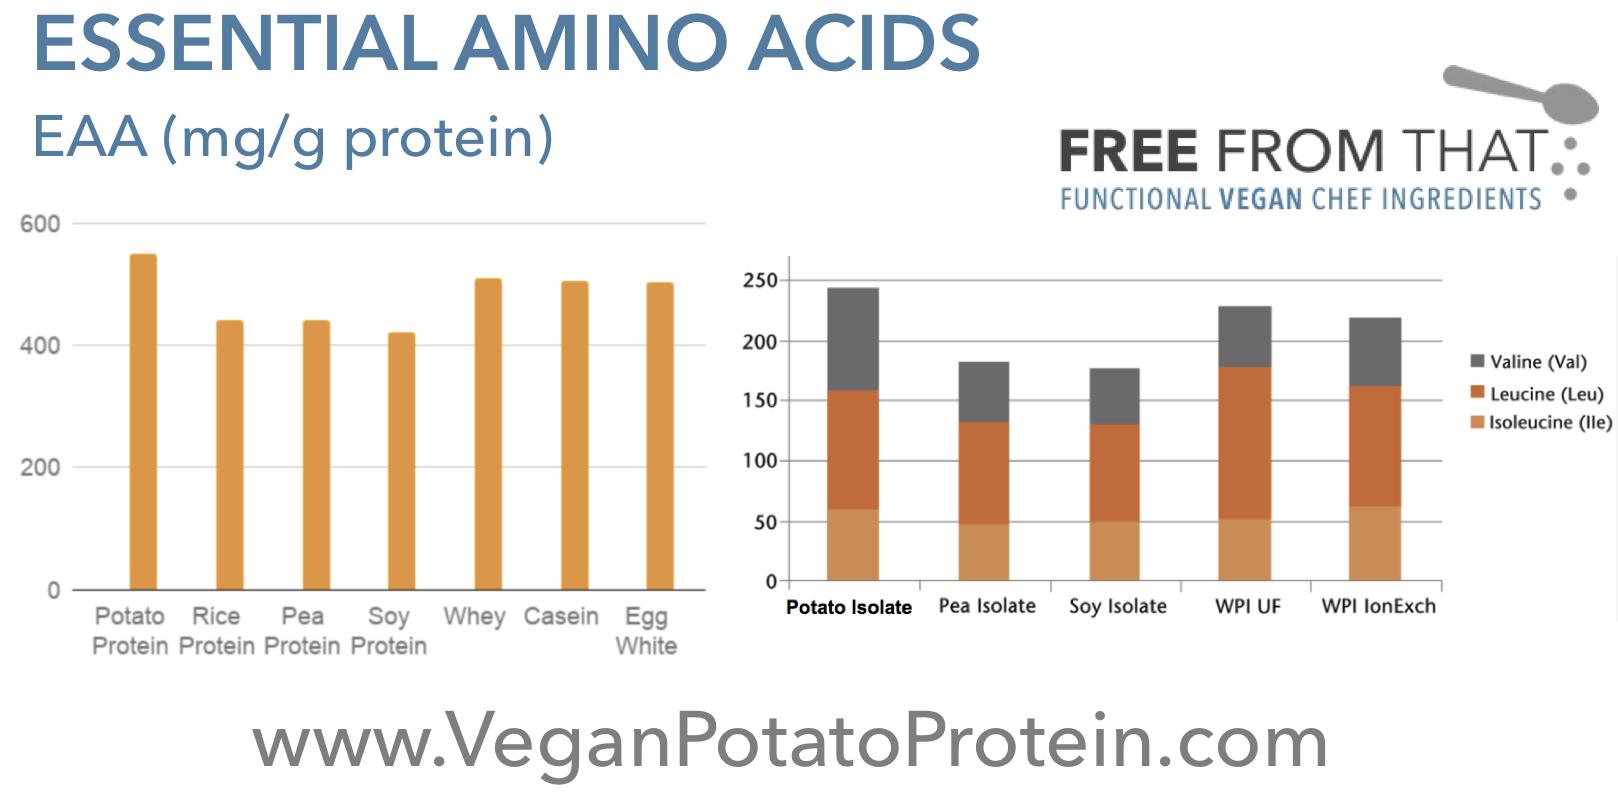 potato-protein-essential-amino-acids.jpg